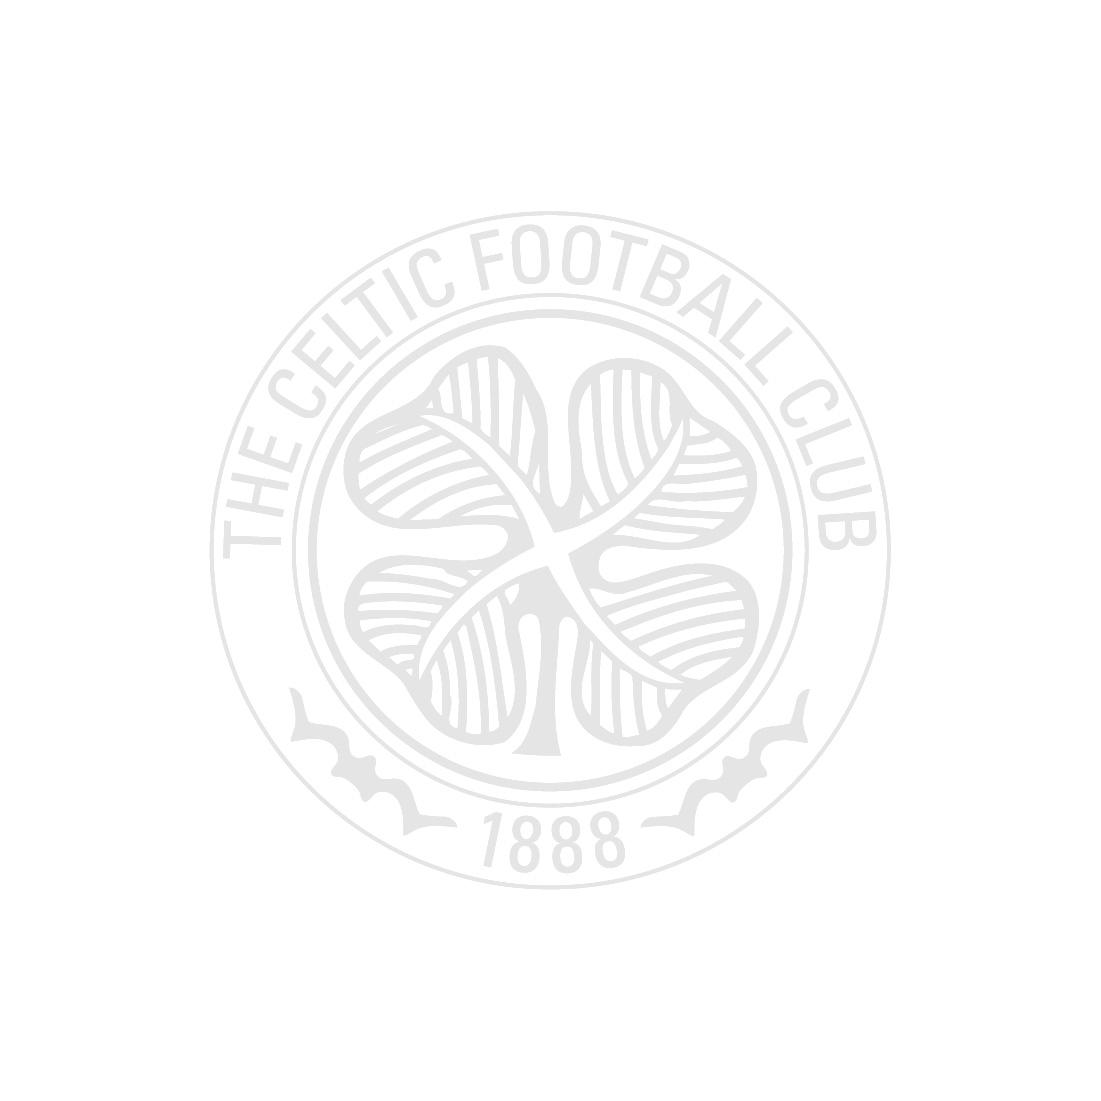 Celtic FC Toblerone